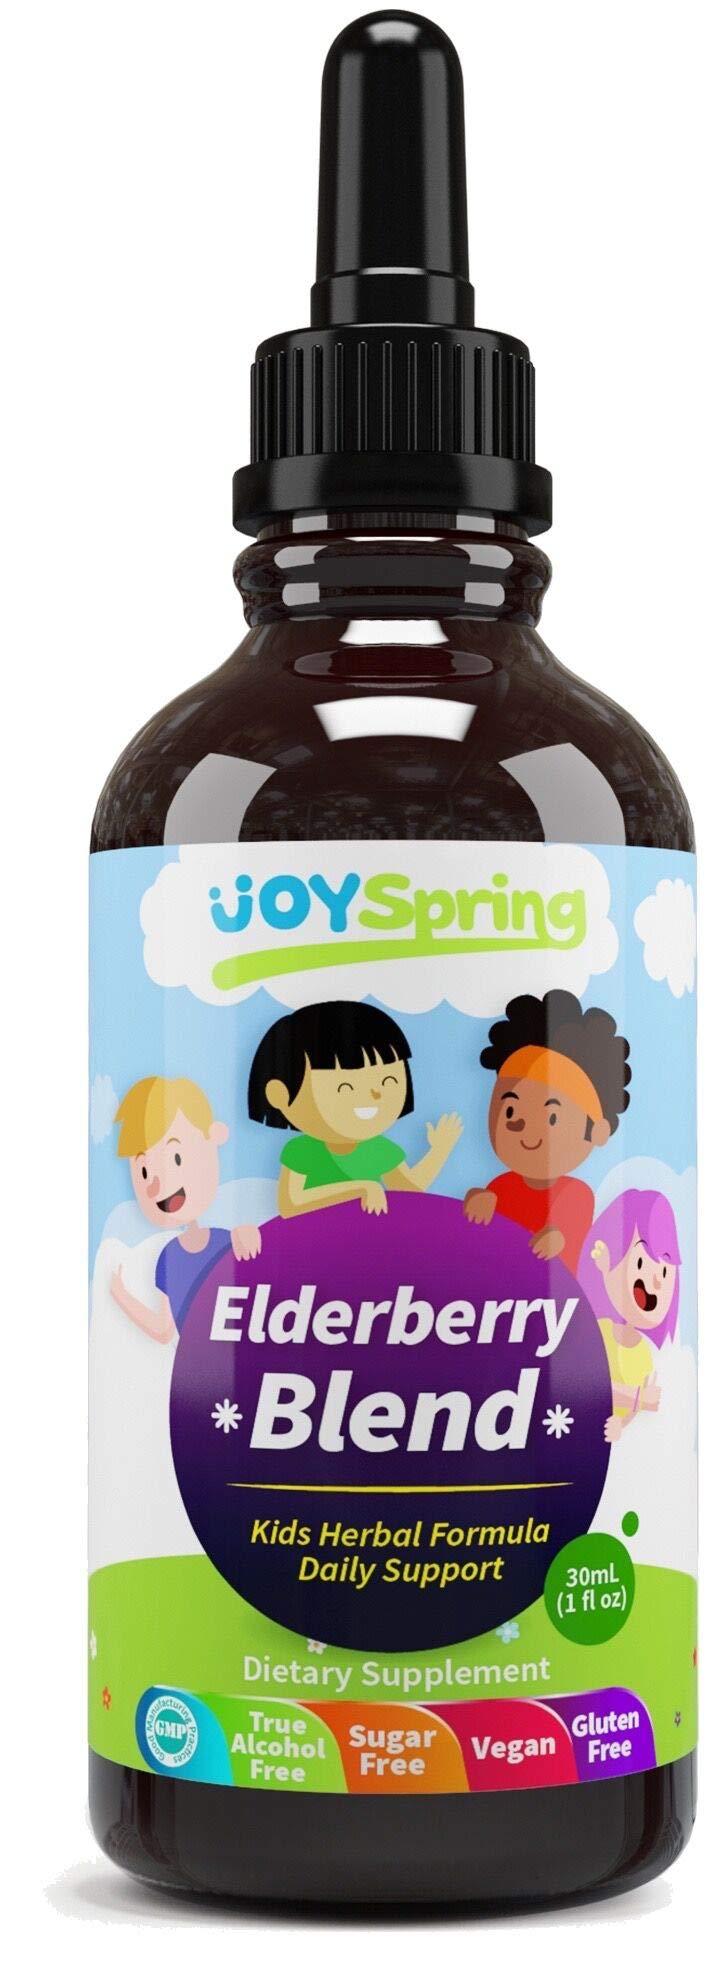 Organic Elderberry Syrup for Kids - Best Natural Kids Cold Medicine, Pure Elderberry Blend for Sickness Relief, 3X Stronger Vegan & Sugar-Free Formula to Strengthen Immune System (4 oz)